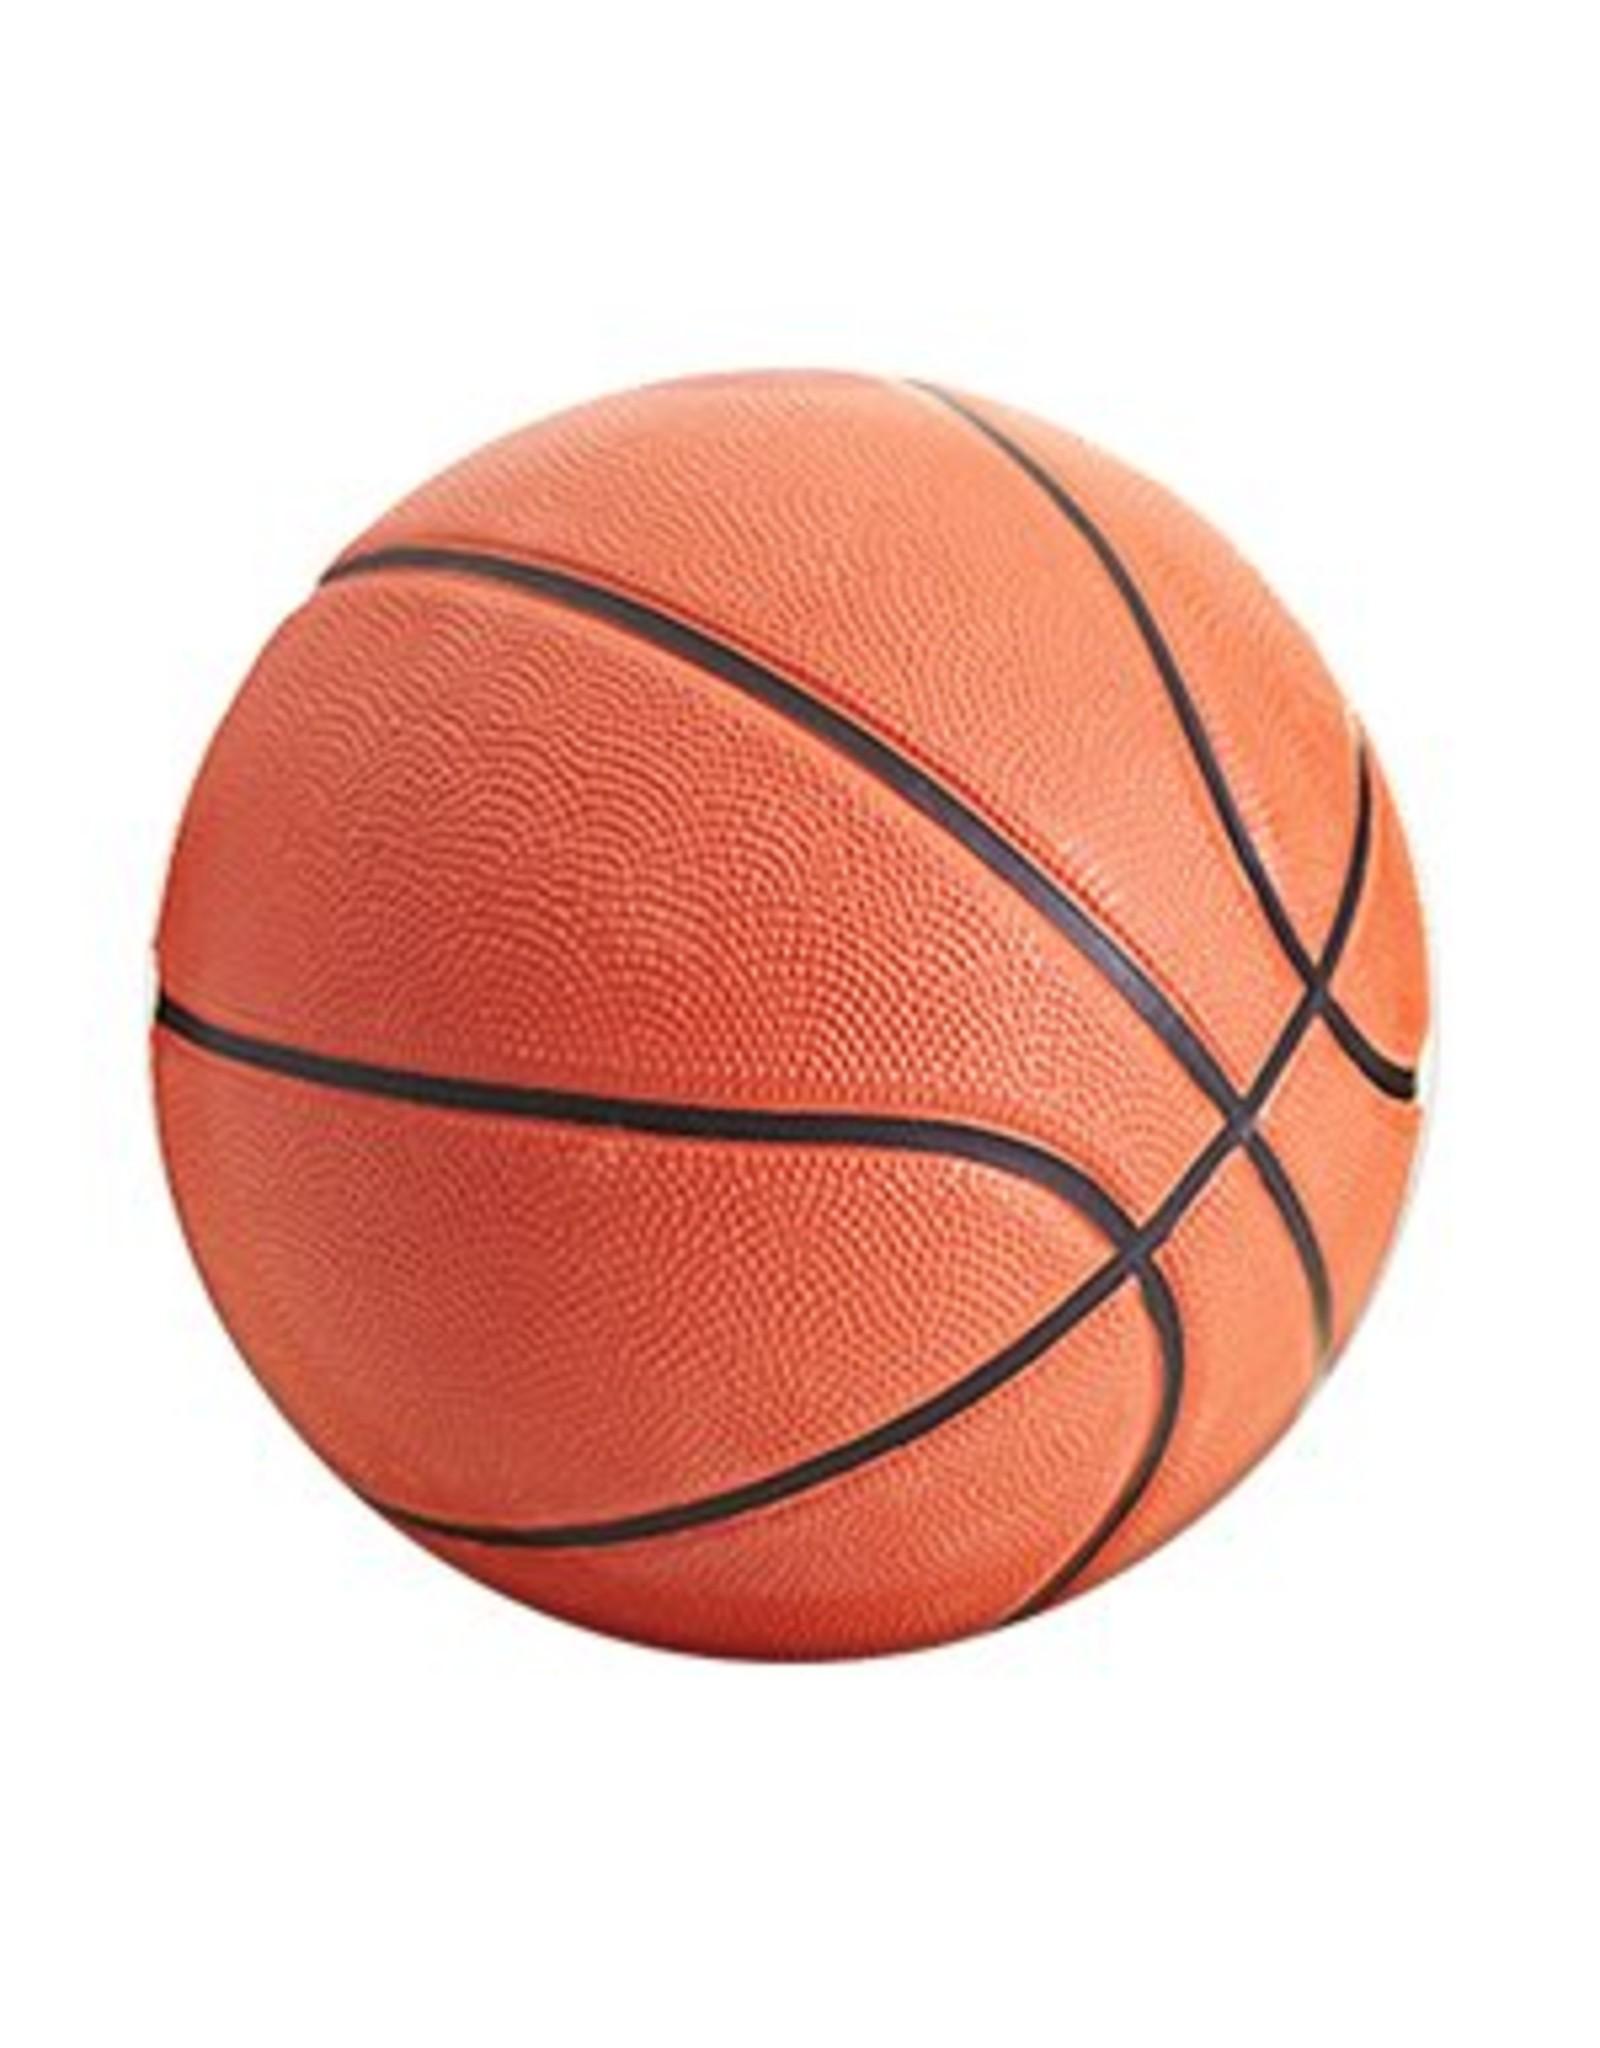 Telefoonbutton 'Basketbal' - Body & Soap